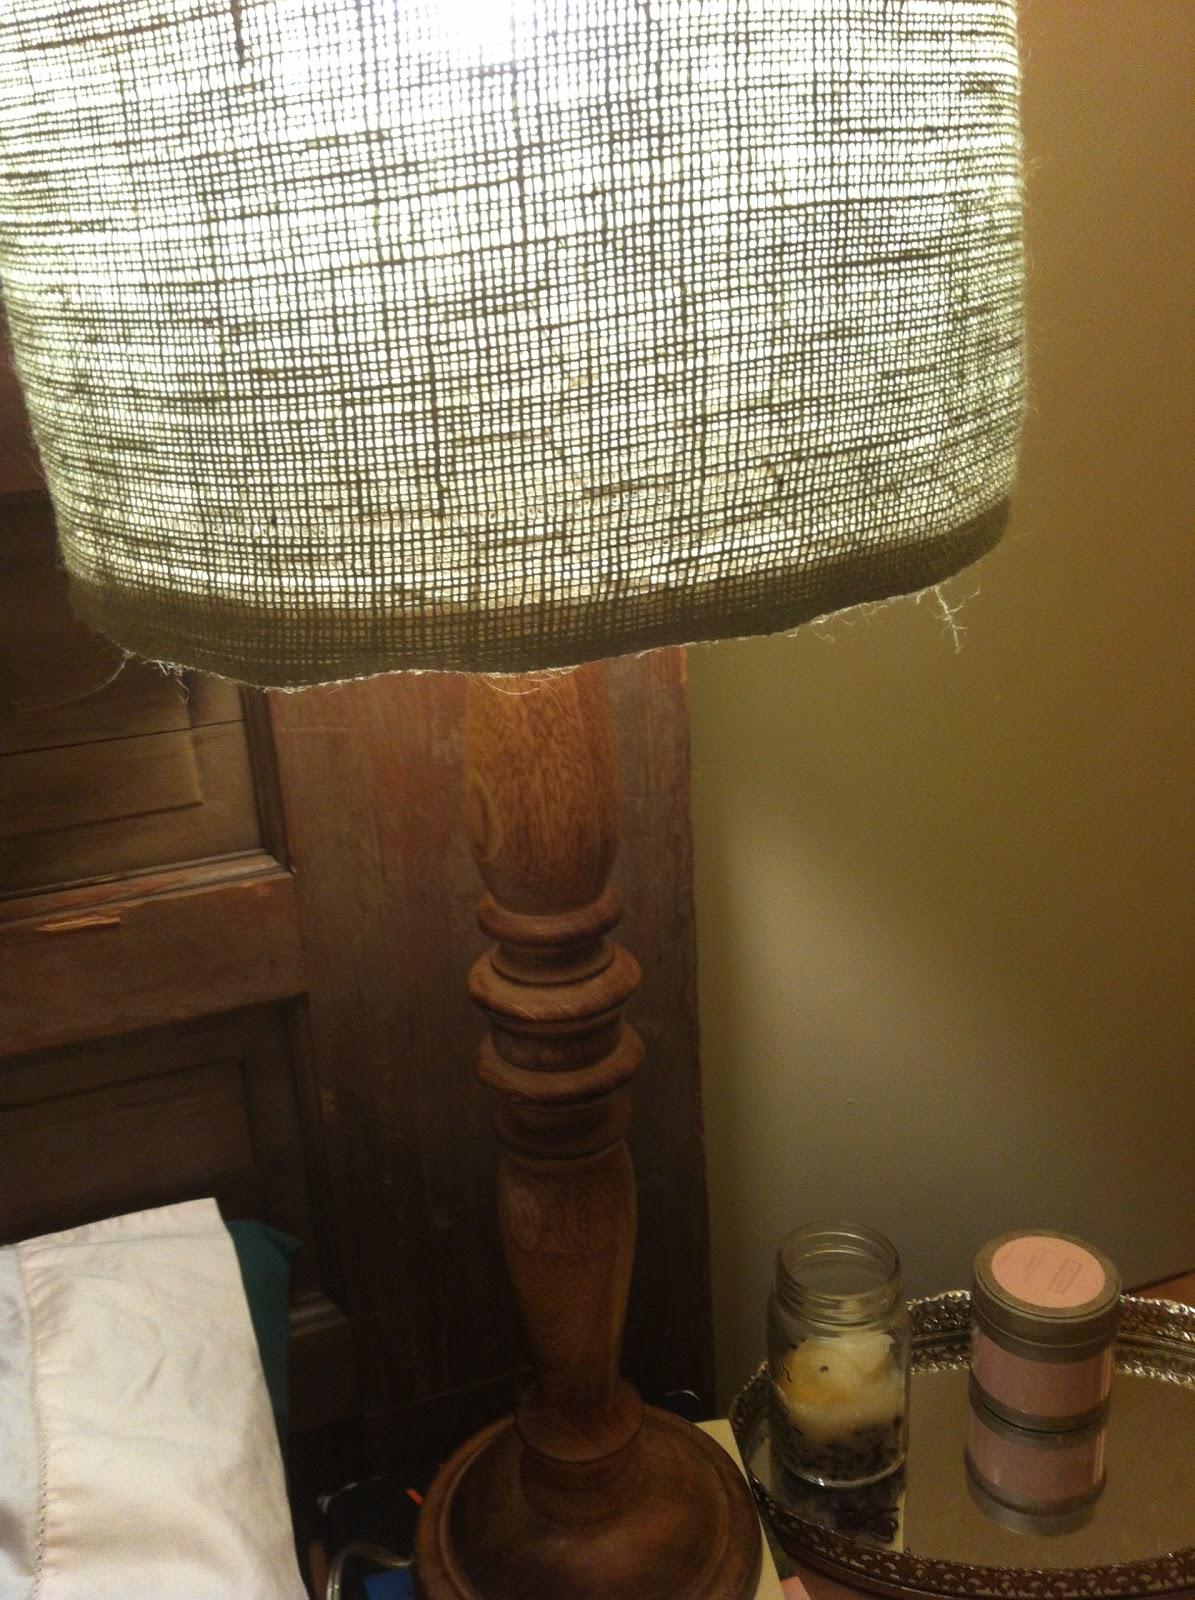 The Adventures of Josh and Haley: DIY Lamp Shade = Temporary FAIL